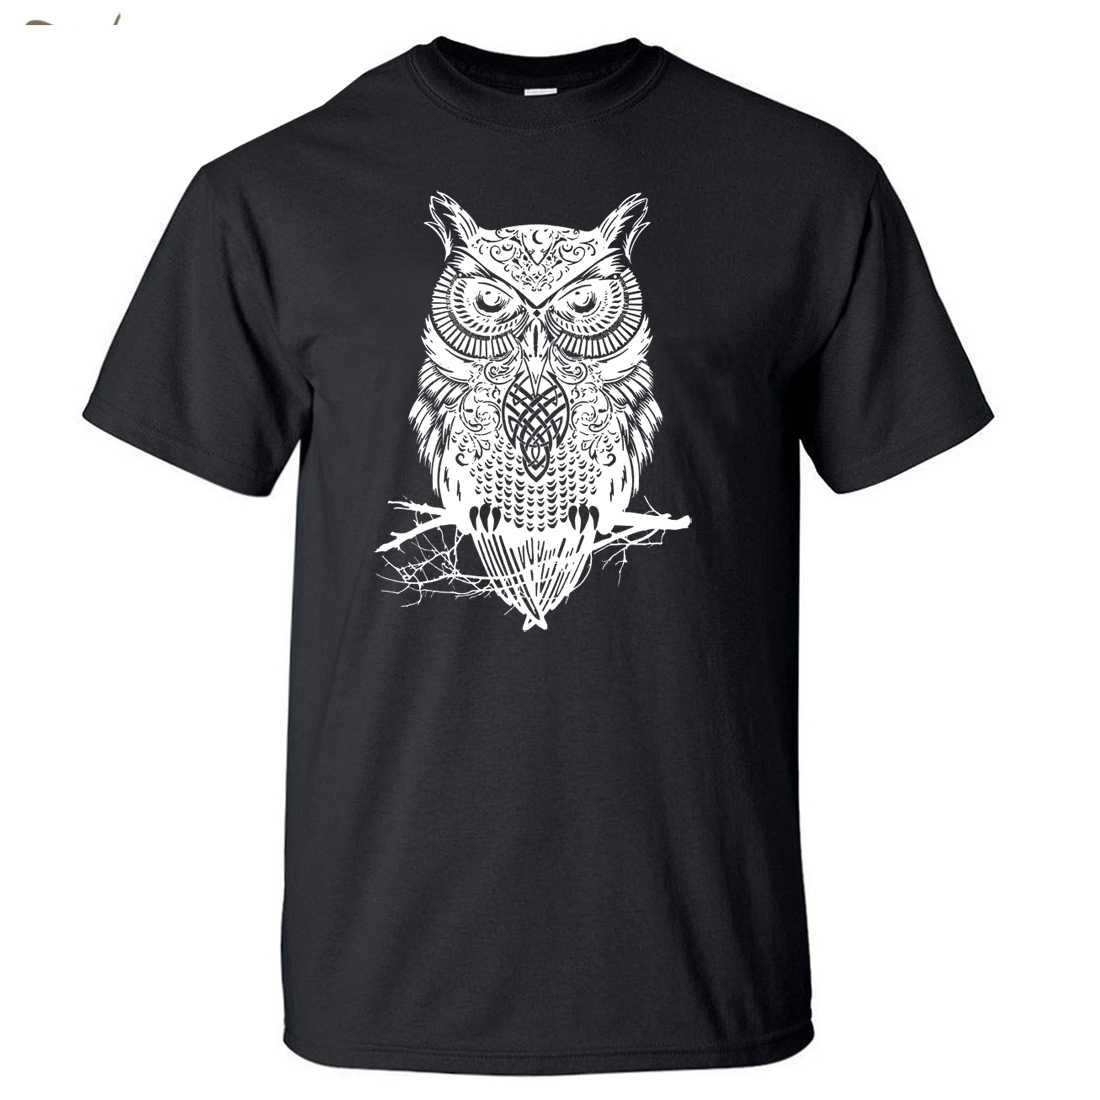 Animal T-Shirt 2018 personnalité unisexe respirant T-Shirt hibou Fitness Original hommes T-Shirt T-Shirt haut T-Shirt marque-vêtements col rond